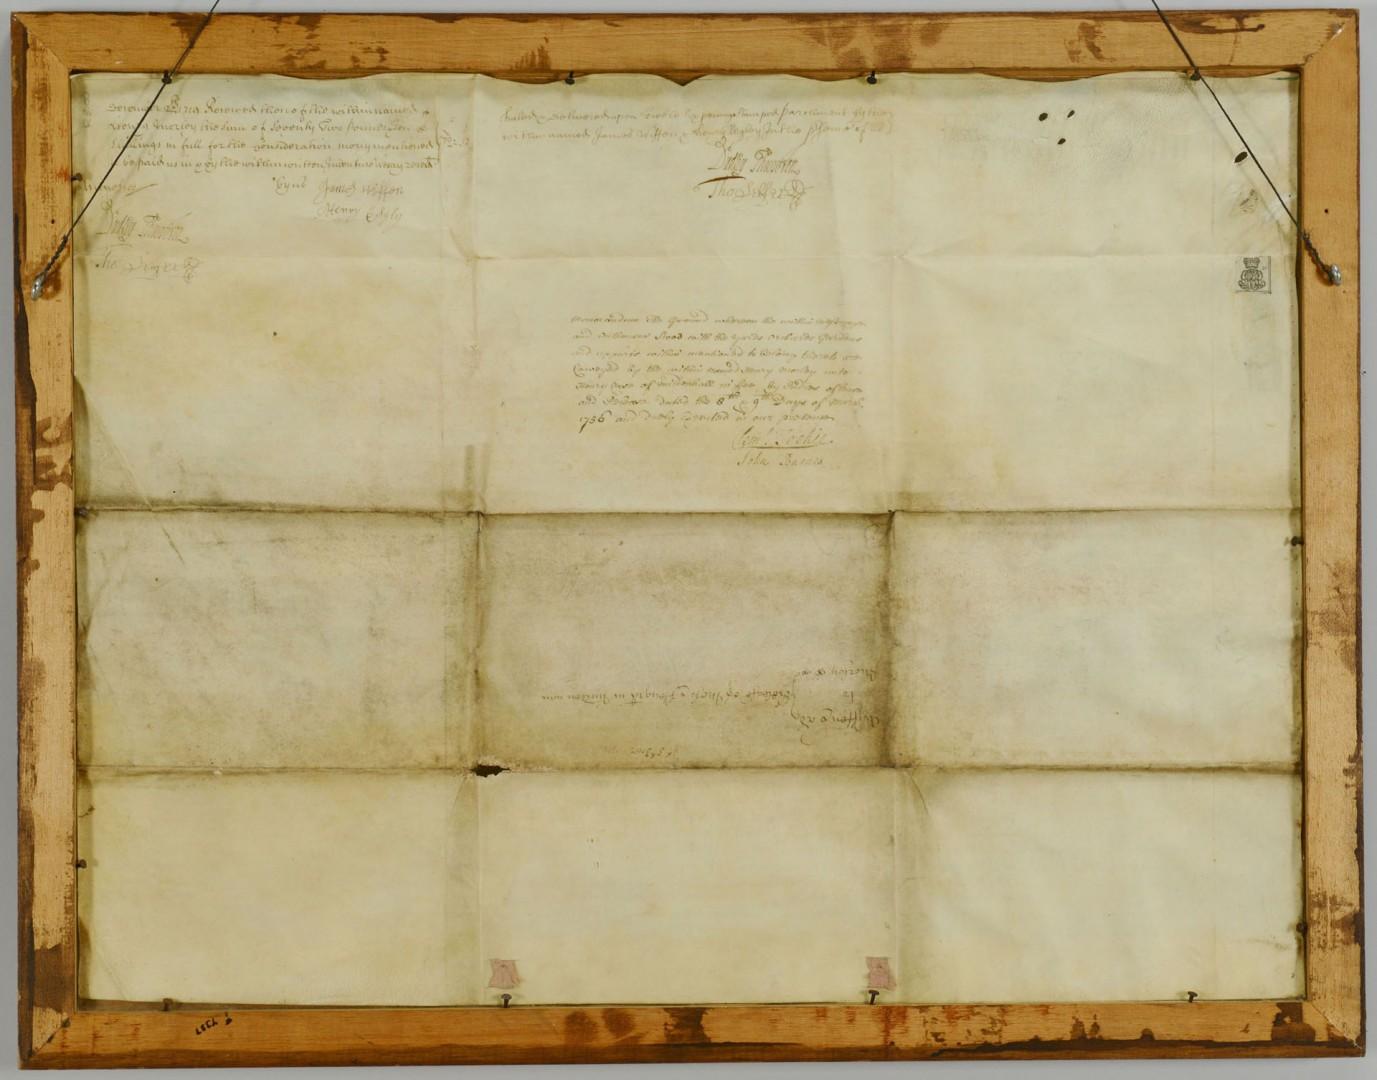 18th Cent. English Indentured Servent Document